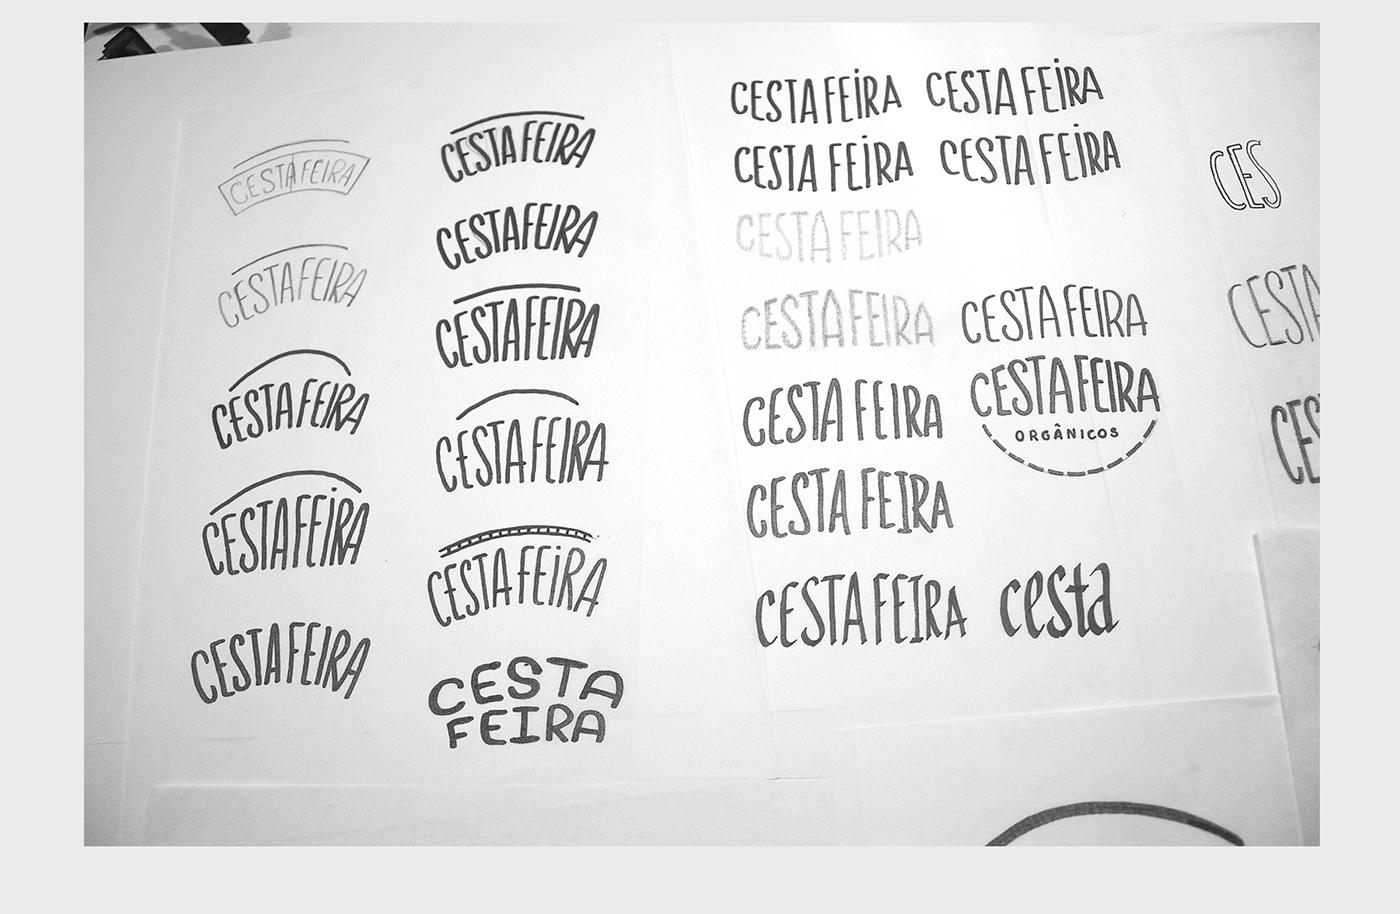 Cesta Feira organic healthy plomo71 Food  green clean